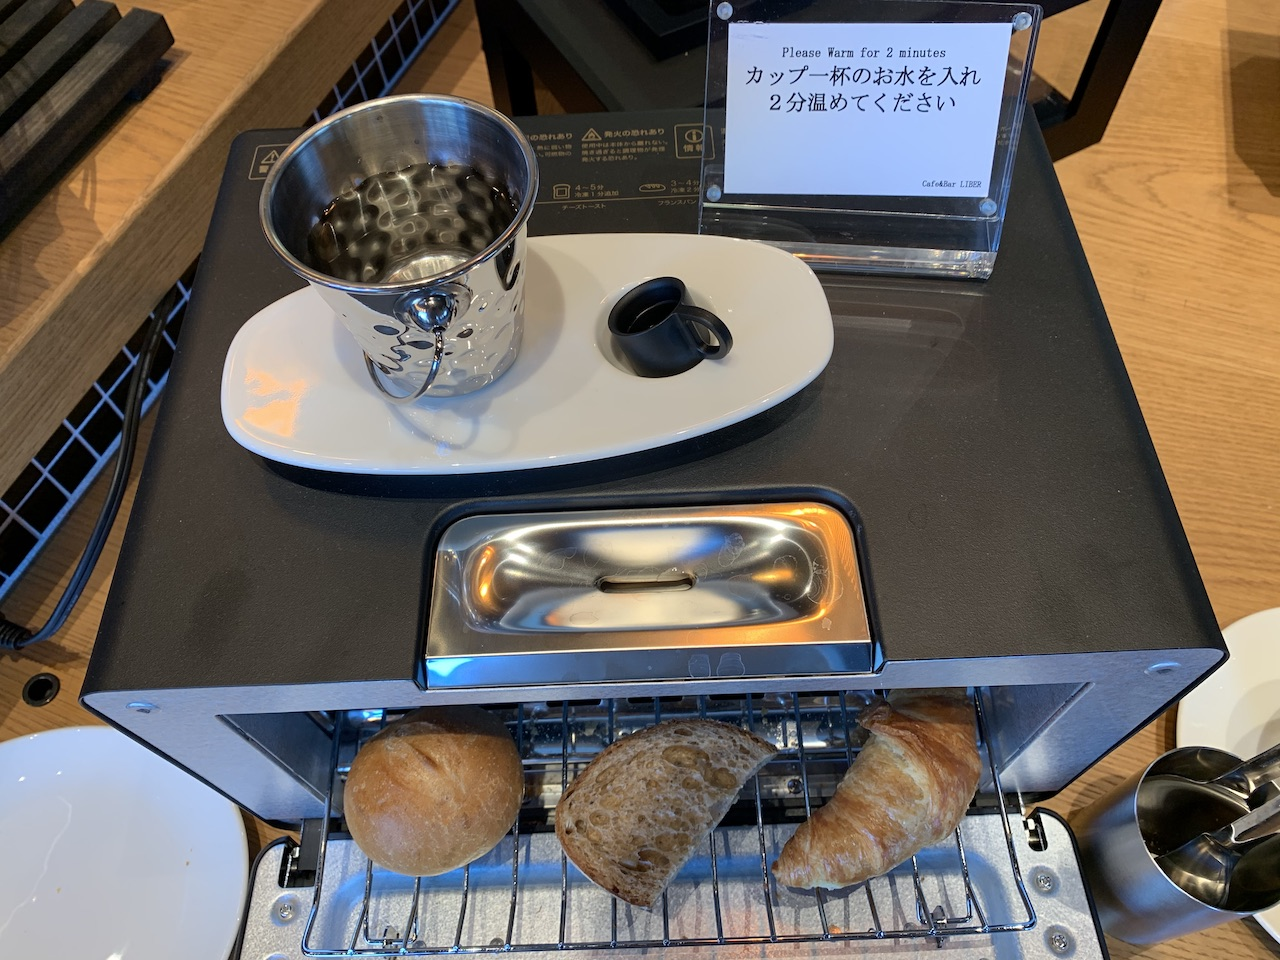 liber-hotel-usj-restaurant-cafe-15